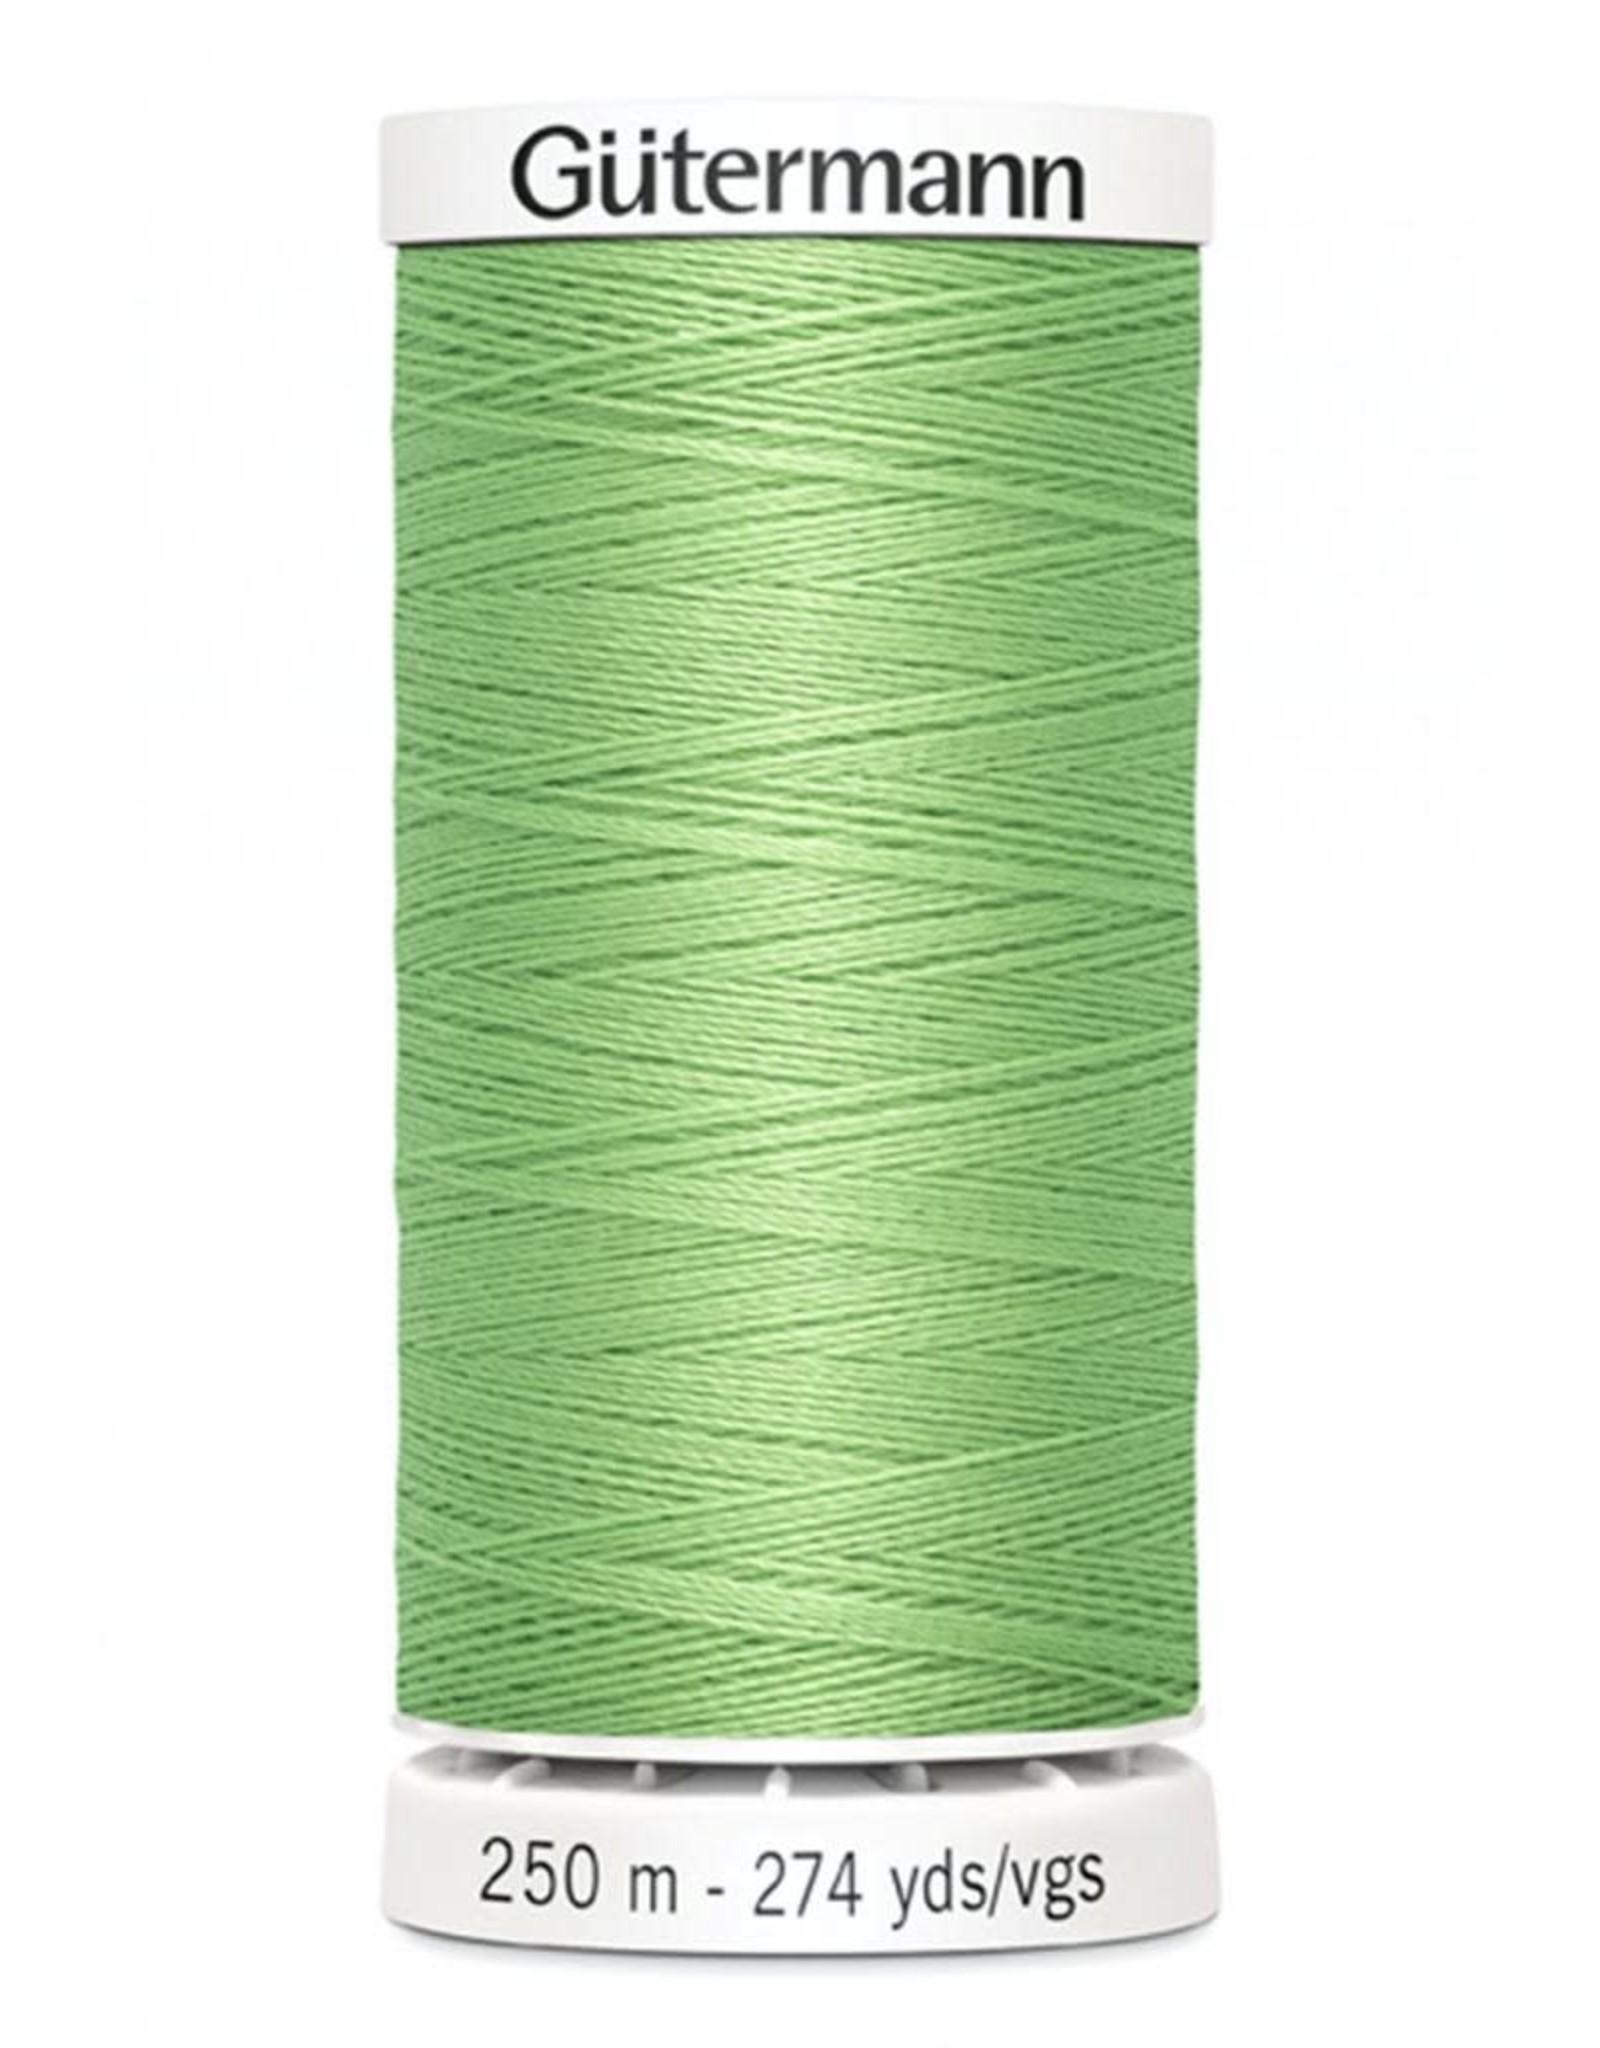 Gutermann Gutermann Thread, 250M-710 New Leaf, Sew-All Polyester All Purpose Thread, 250m/273yds